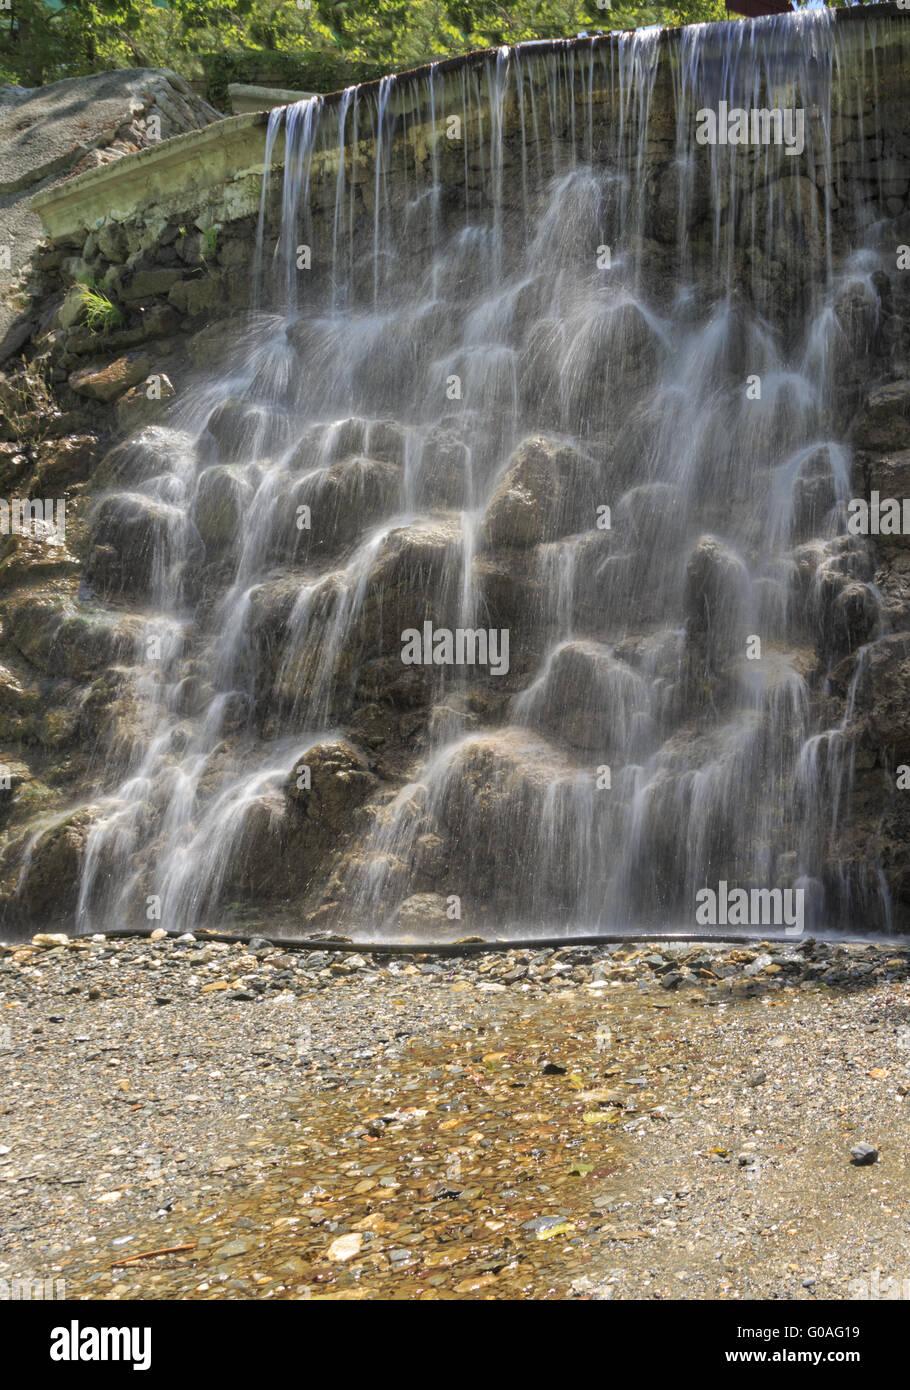 Waterfall at Dim river - Stock Image